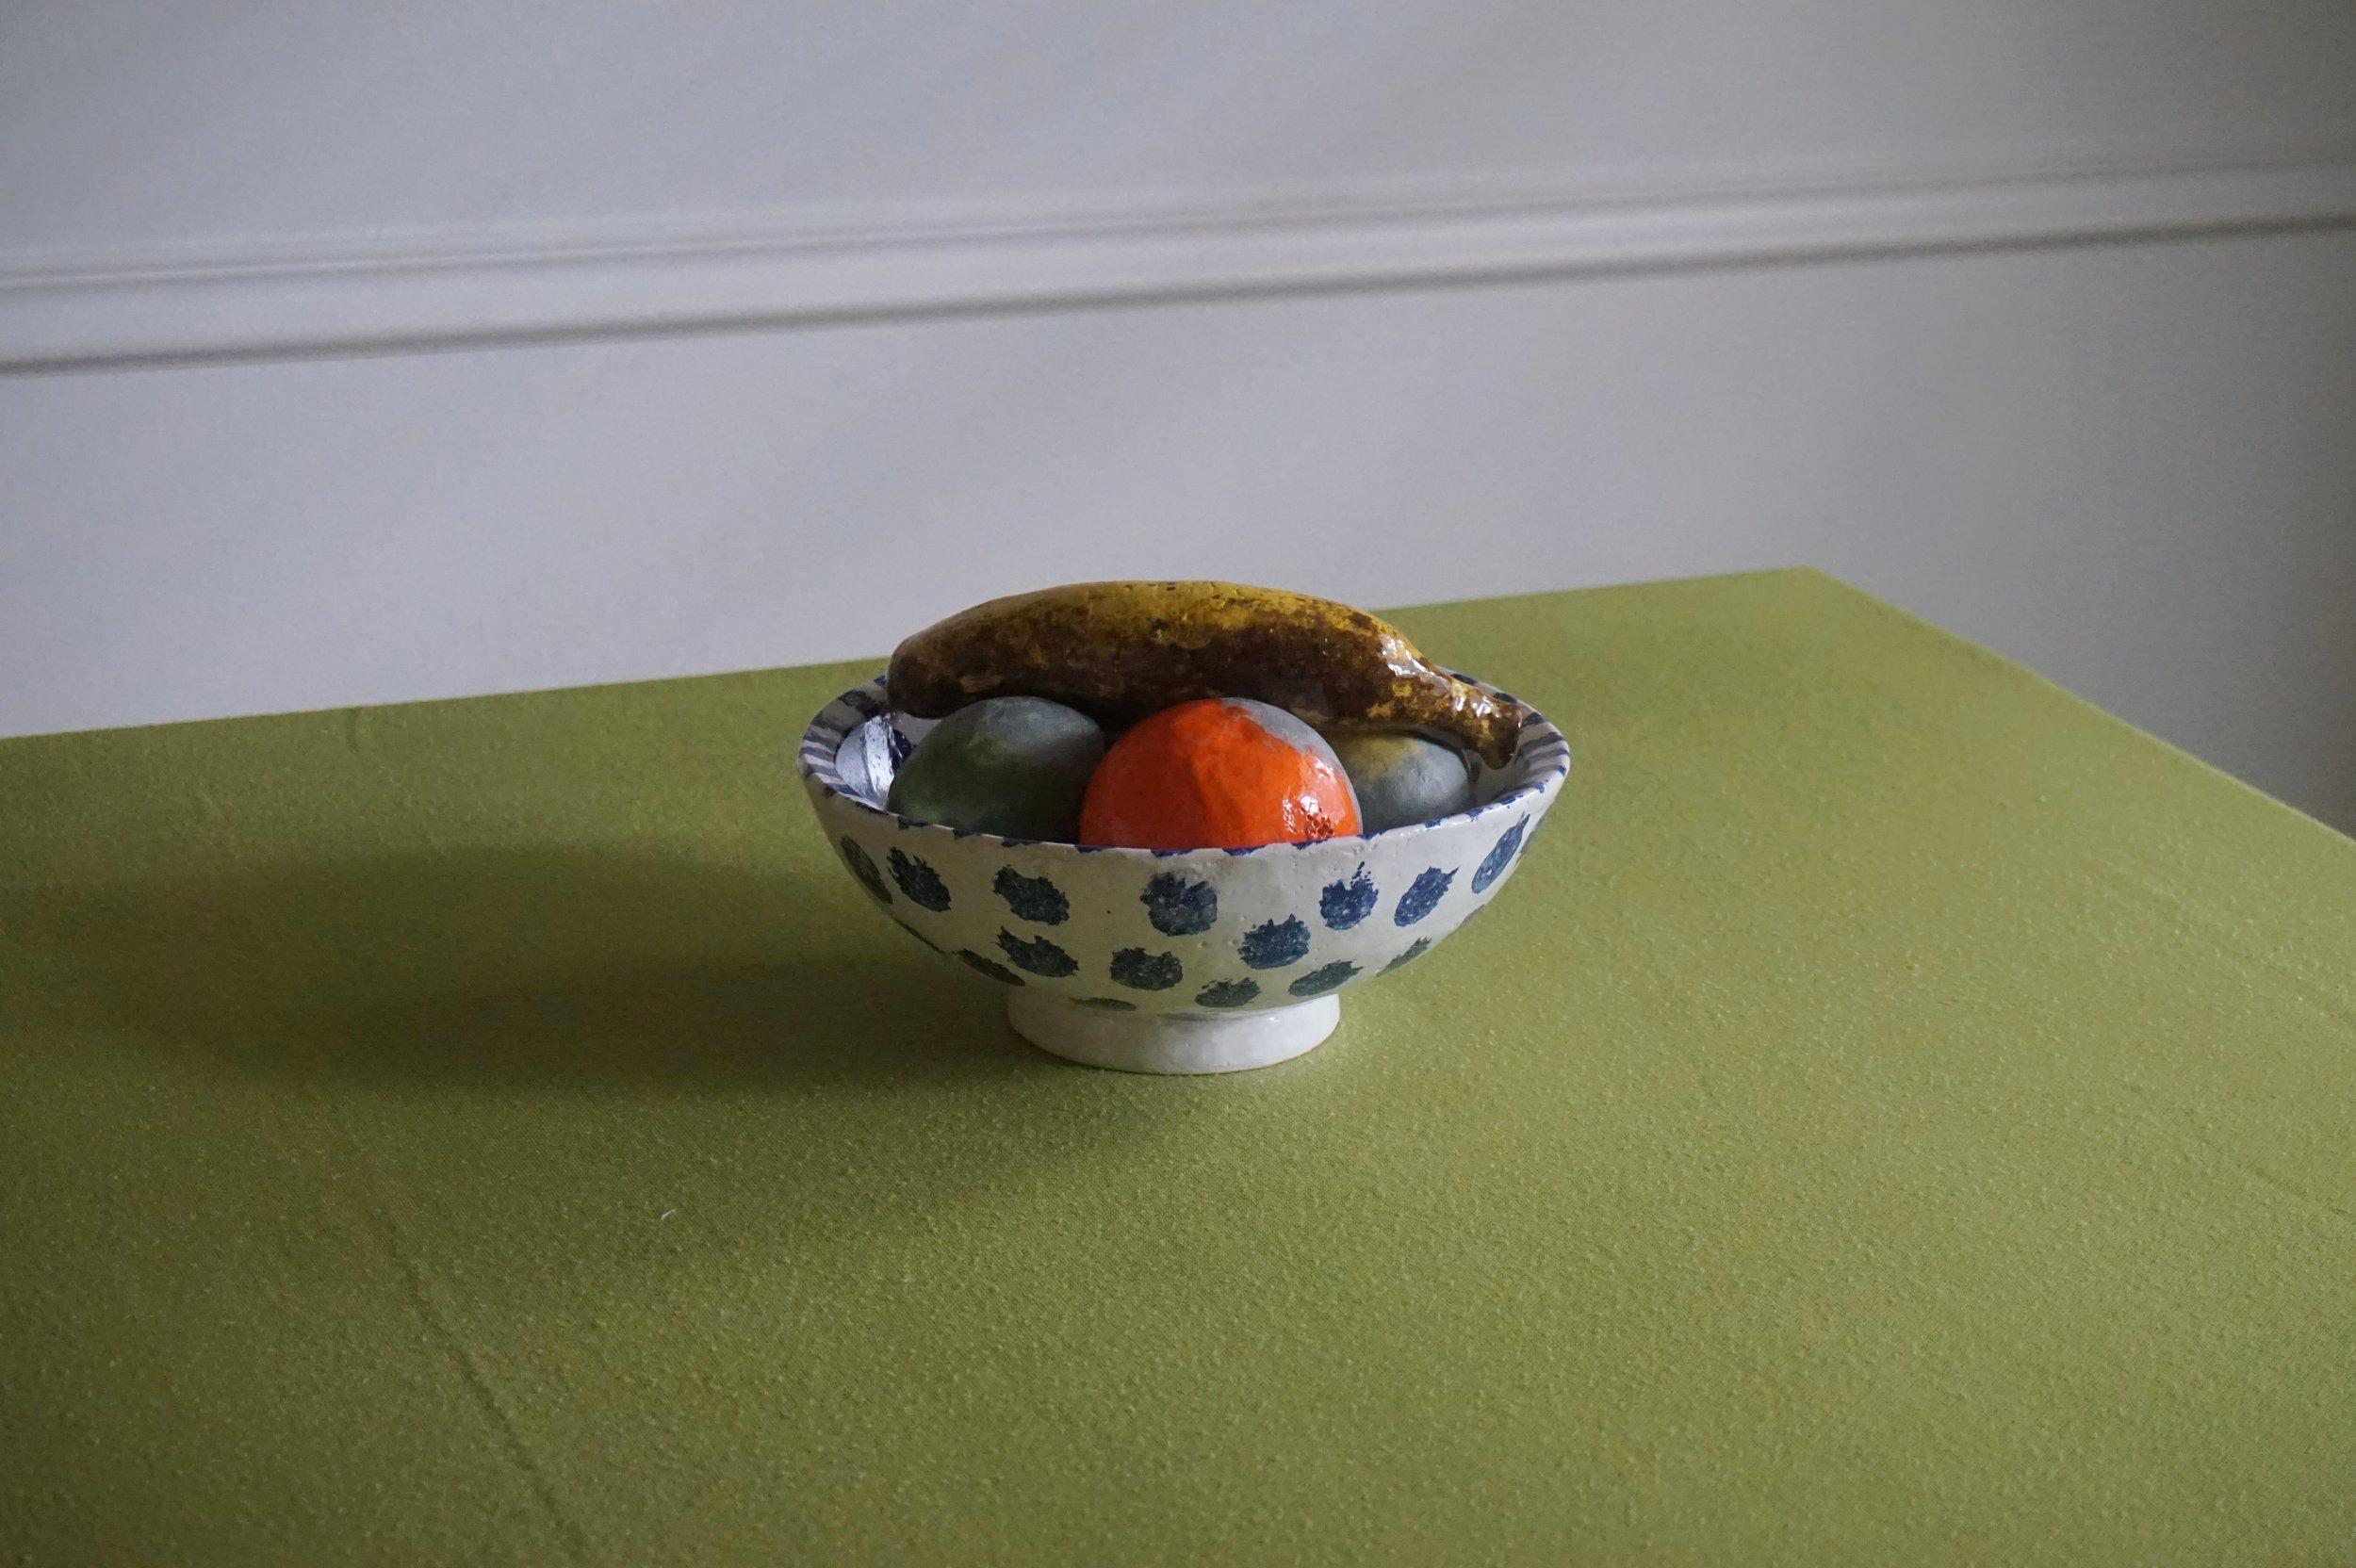 Bowl of Moldy Fruit